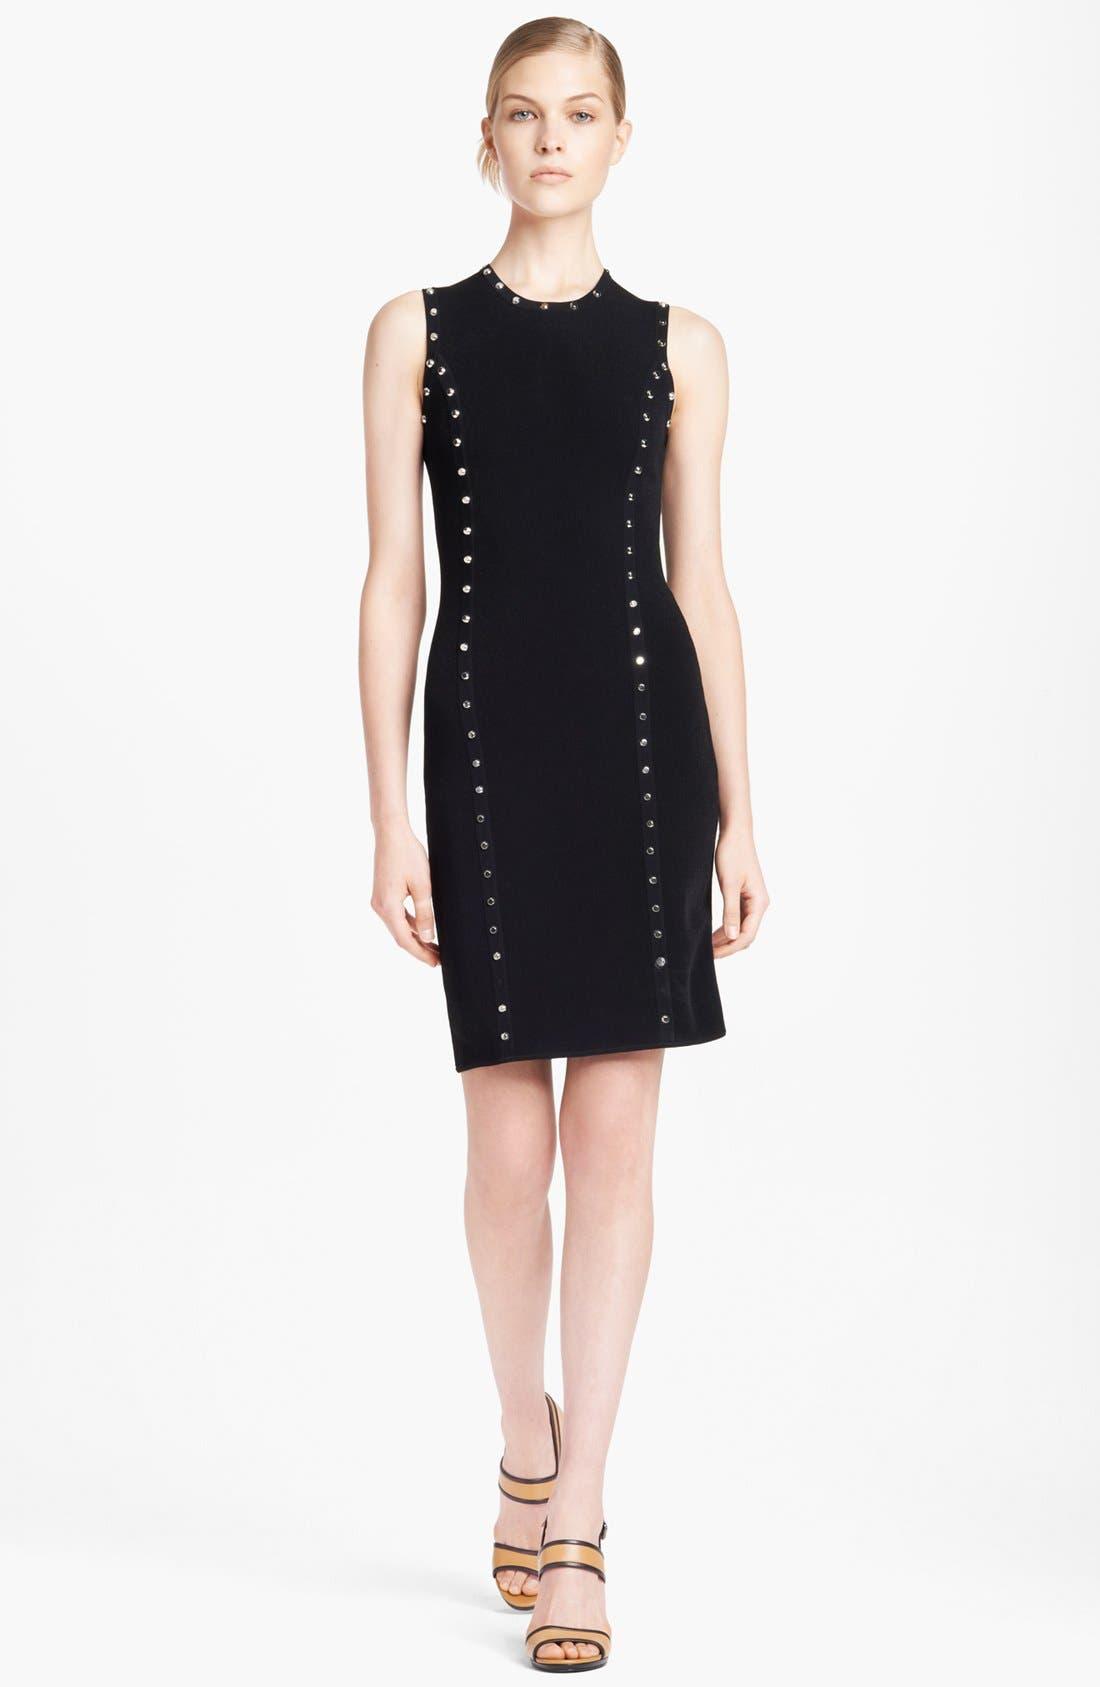 Michael Kors Studded Knit Dress